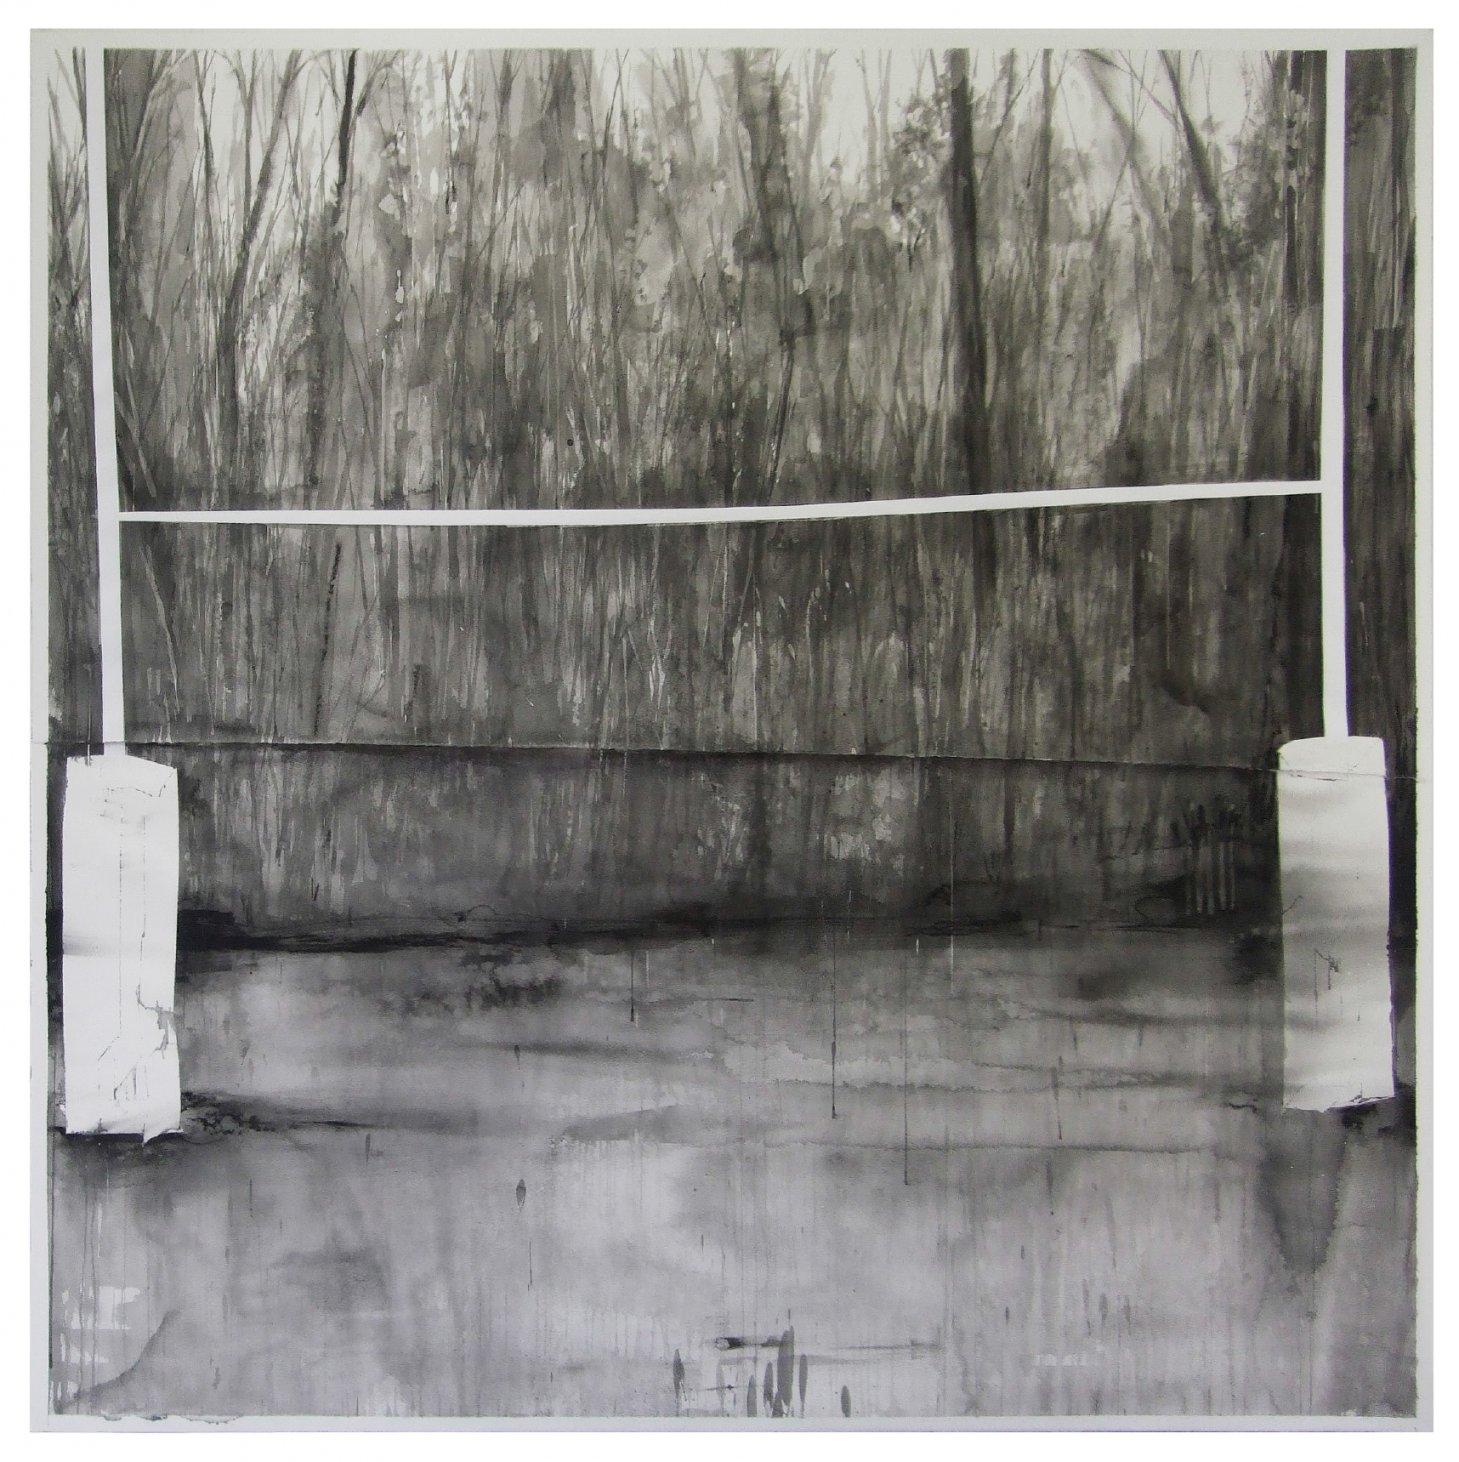 TERCER TIEMPO (2008) - Alain Urrutia